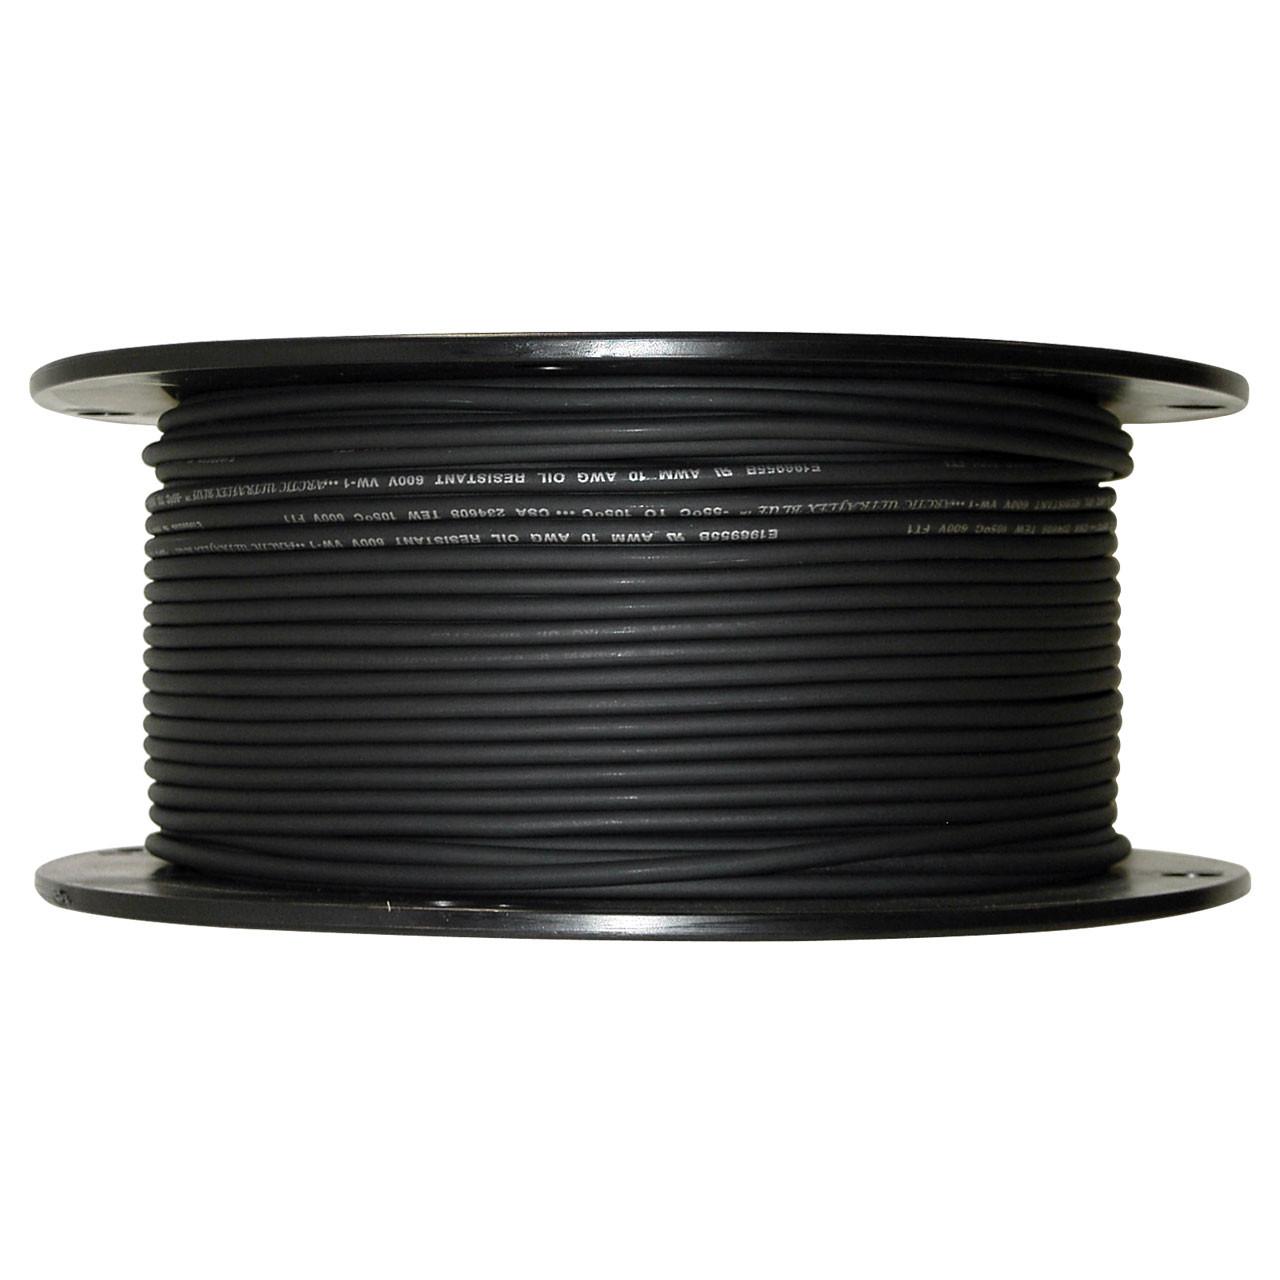 ARCTIC ULTRAFLEX 10GA BLK 500 FOOT ROLL - Polar Wire Products